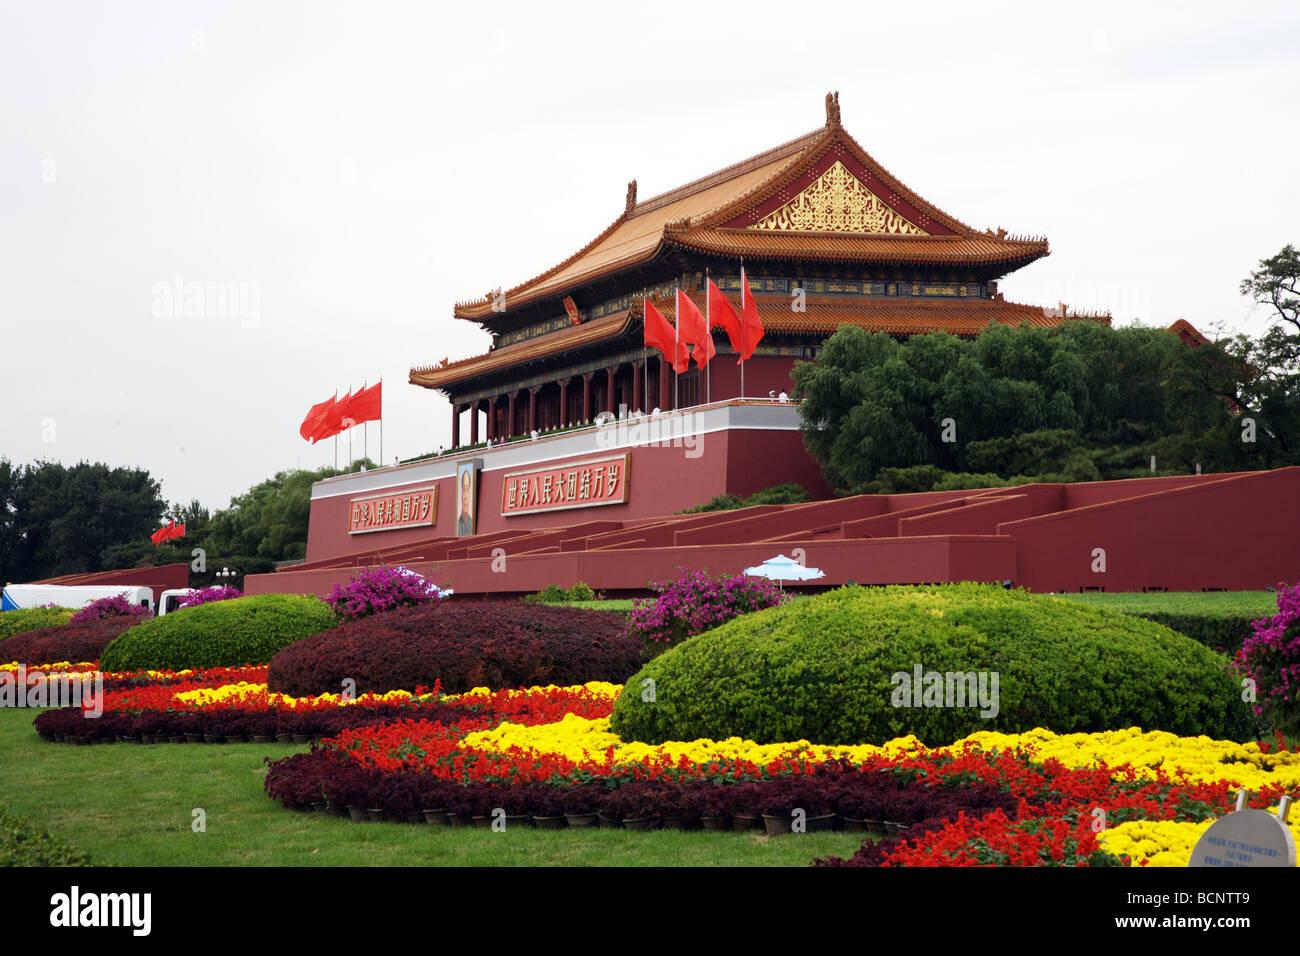 The Tian'anmen Rostrum in Tian'anmen Square, Beijing, China - Stock Image